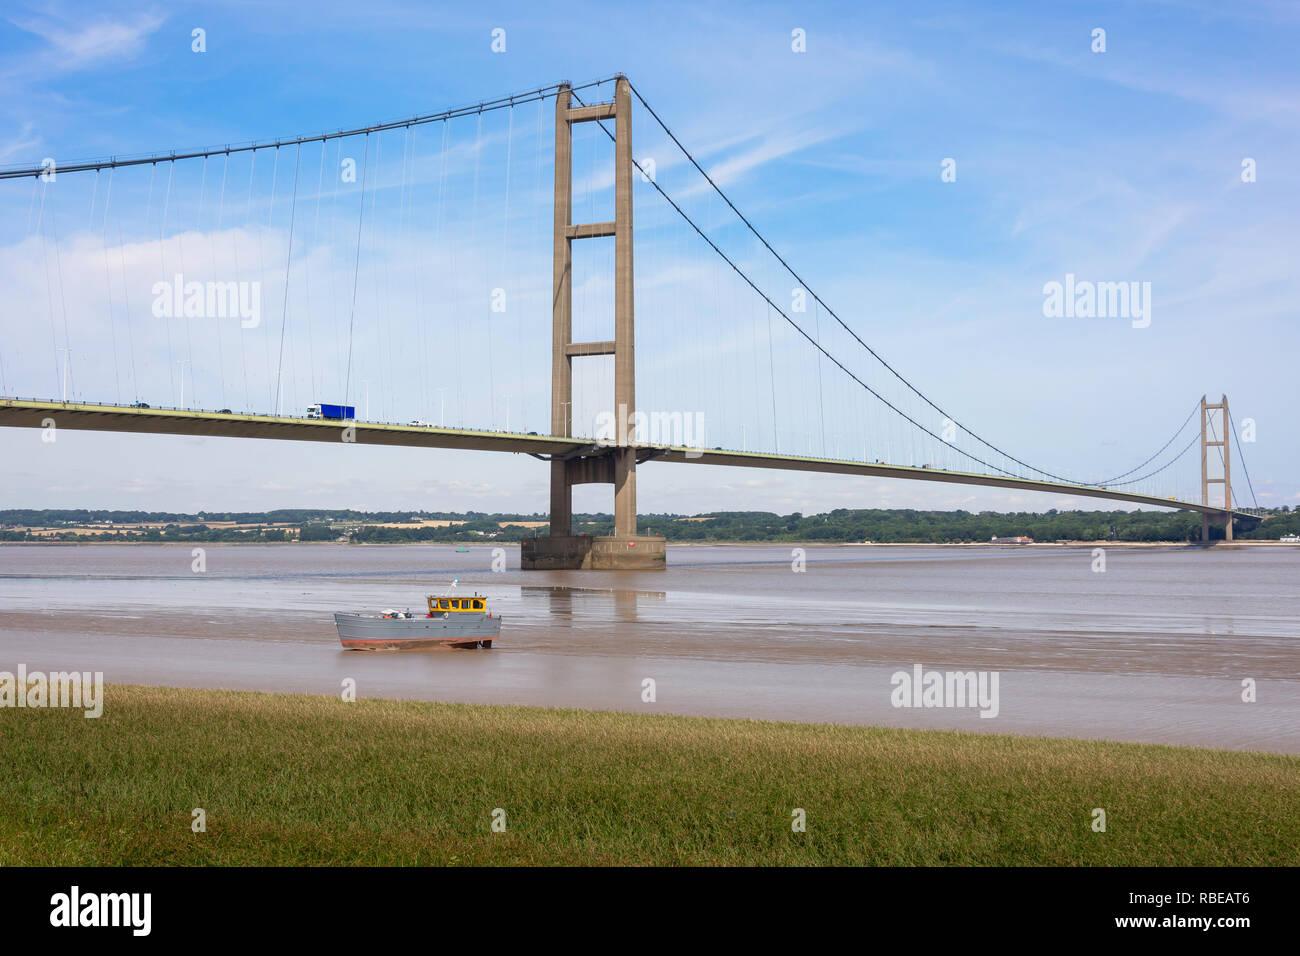 The Humber Bridge over Humber river, Barton-upon-Humber, Lincolnshire, England, United Kingdom Stock Photo